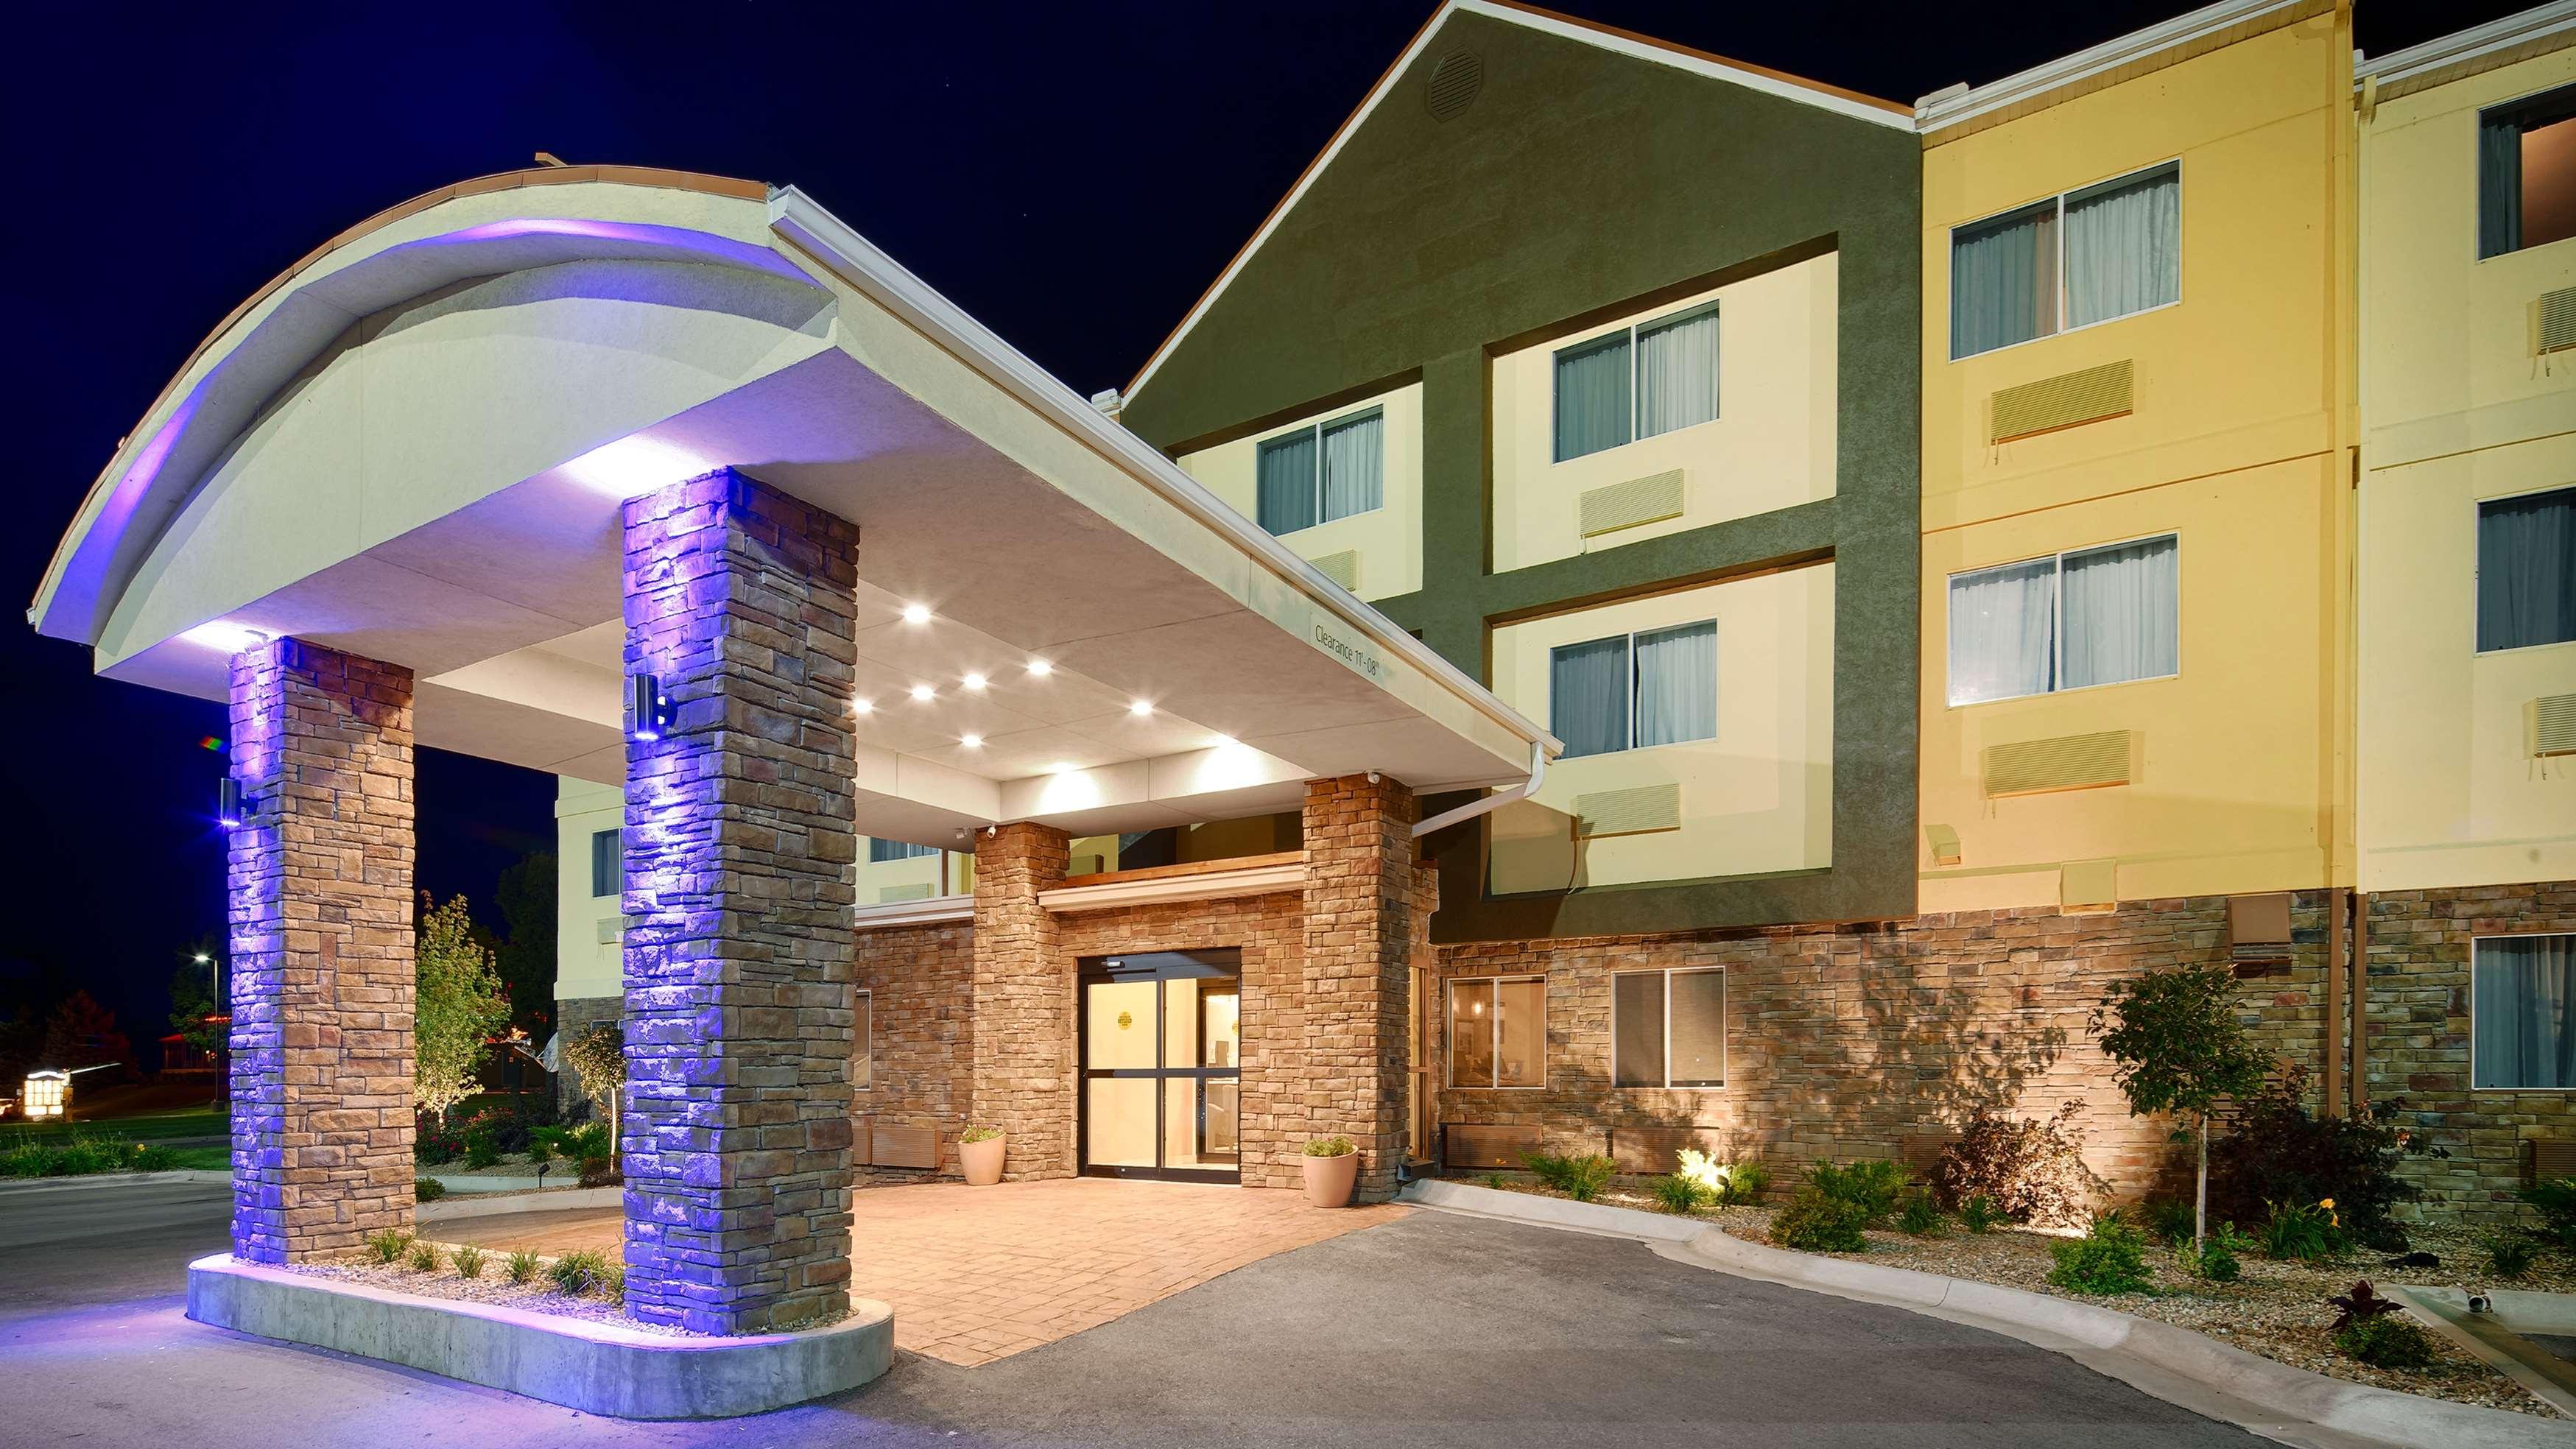 Best Western Pearl City Inn image 0